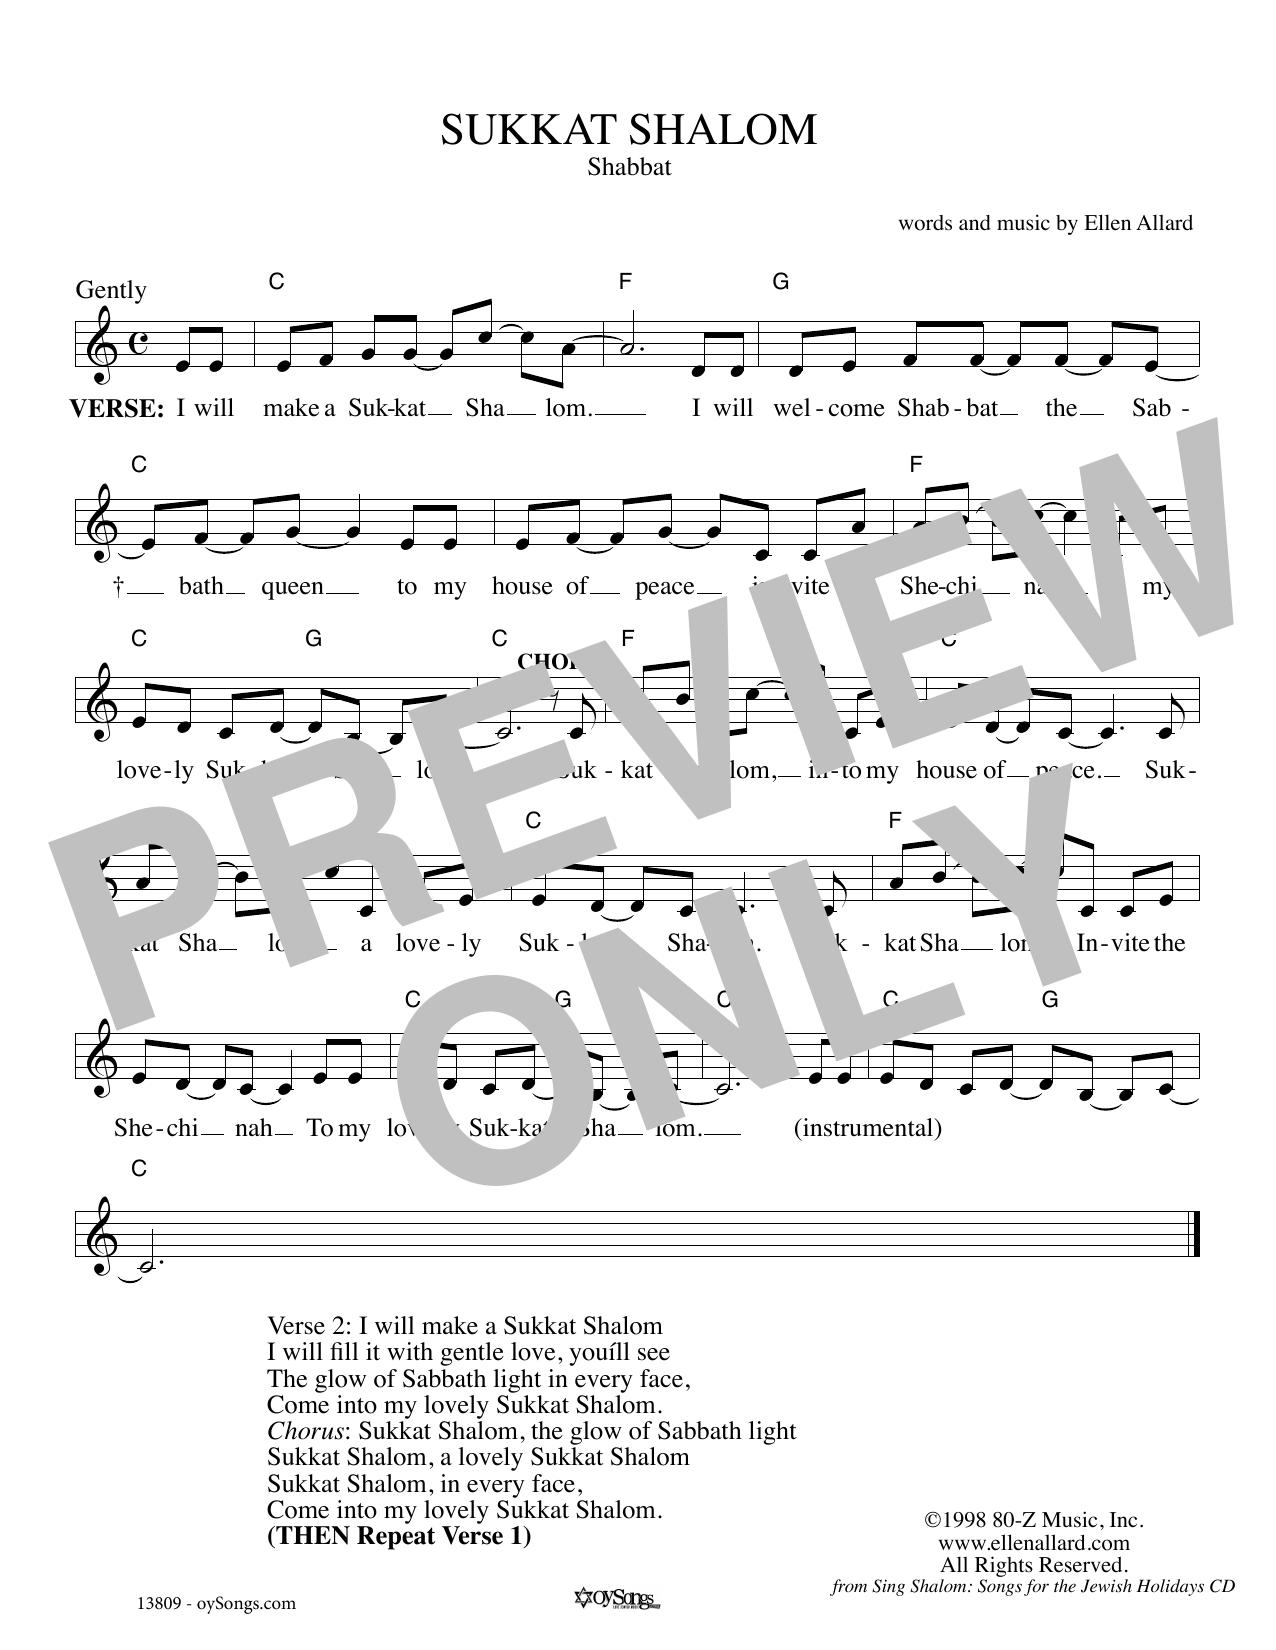 Ellen Allard Sukkat Shalom sheet music notes and chords. Download Printable PDF.